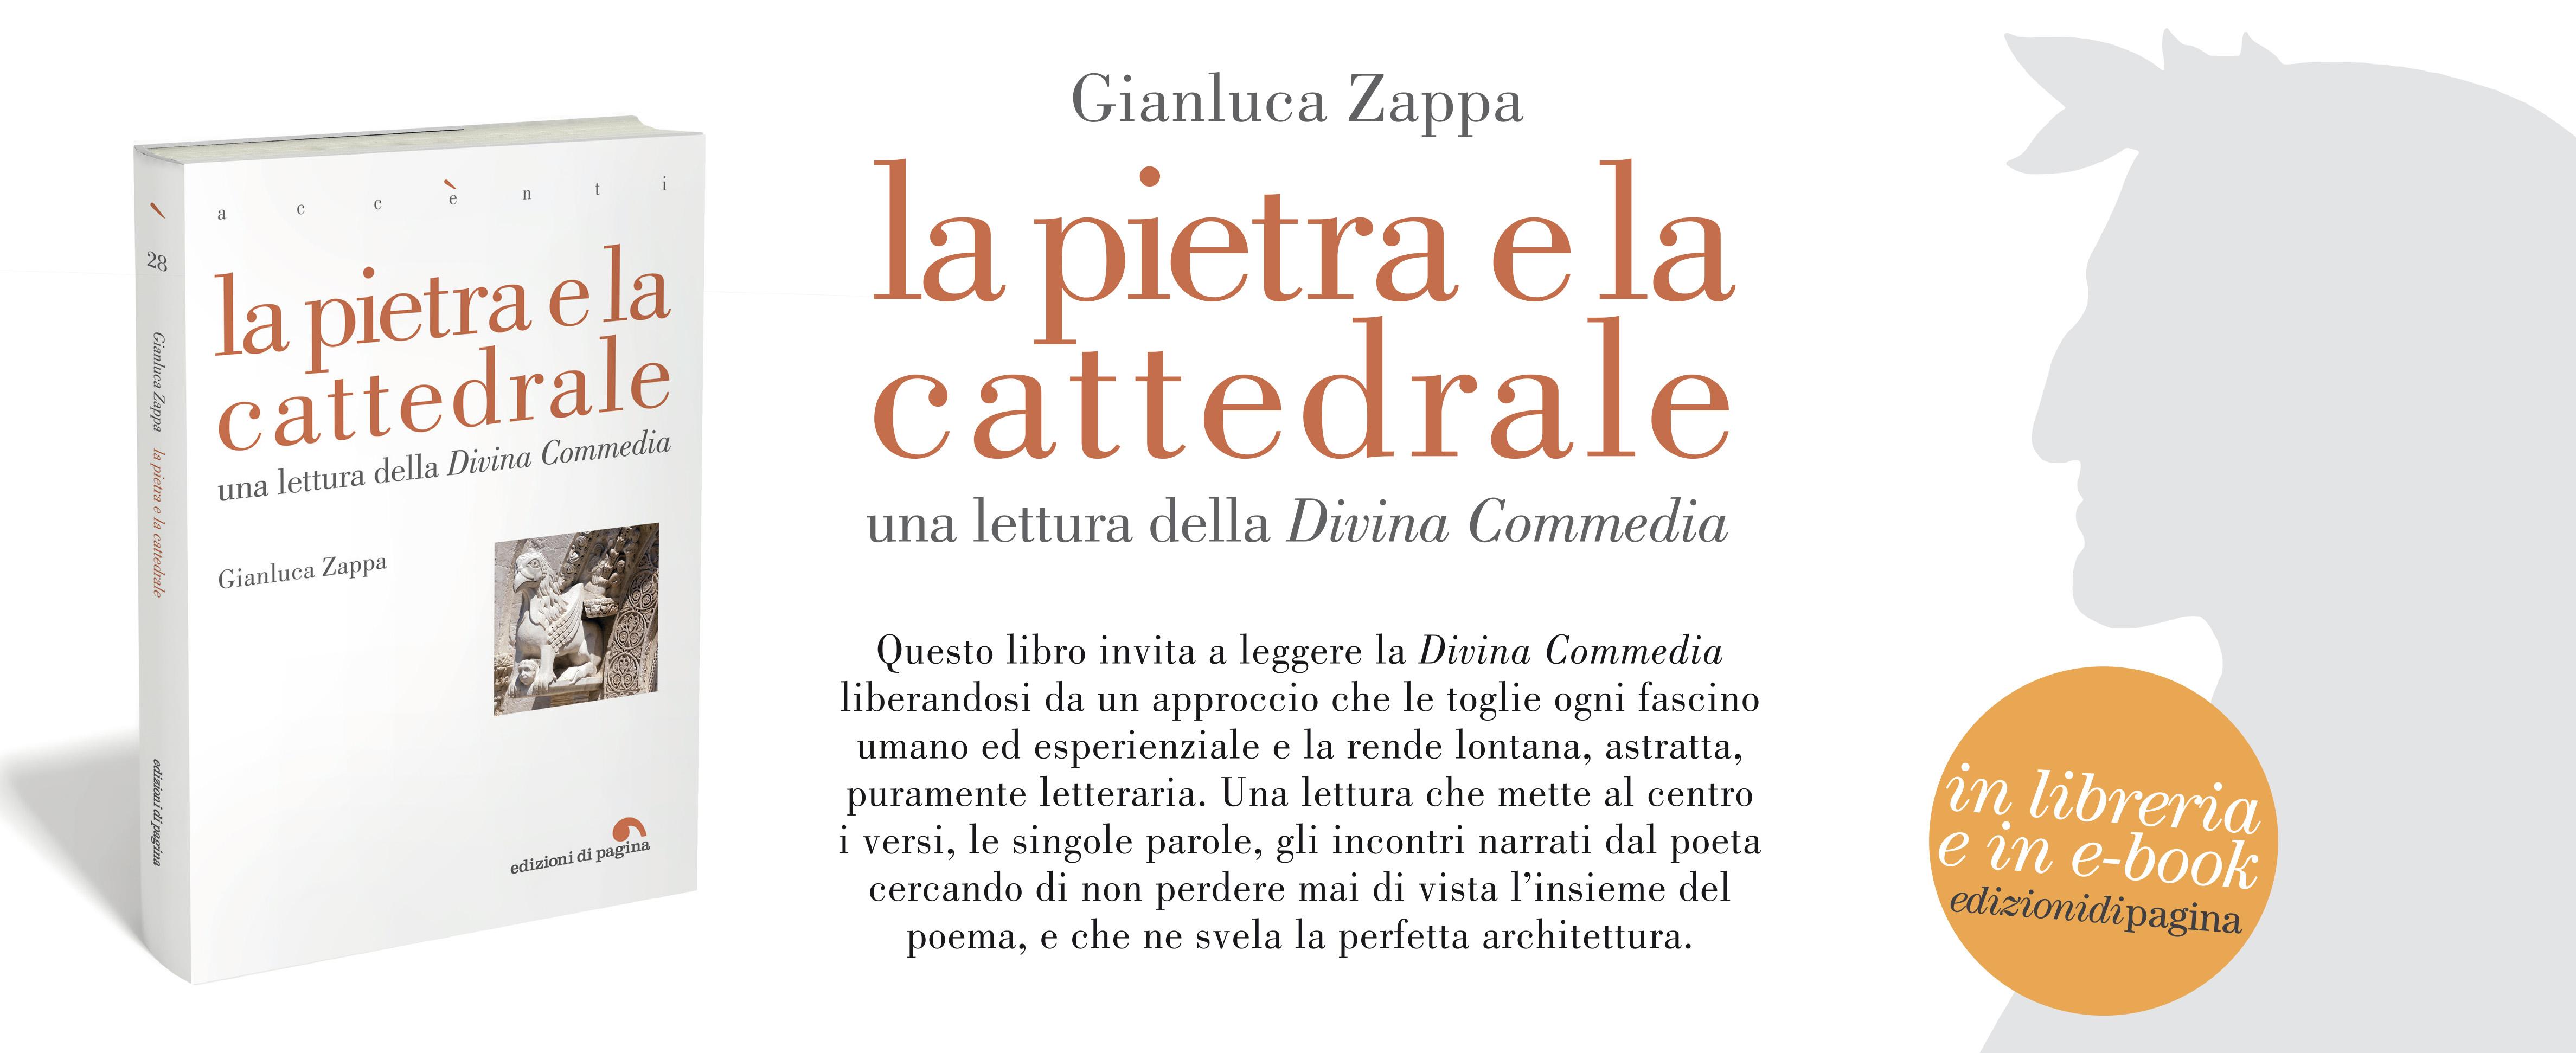 Slide Zappa